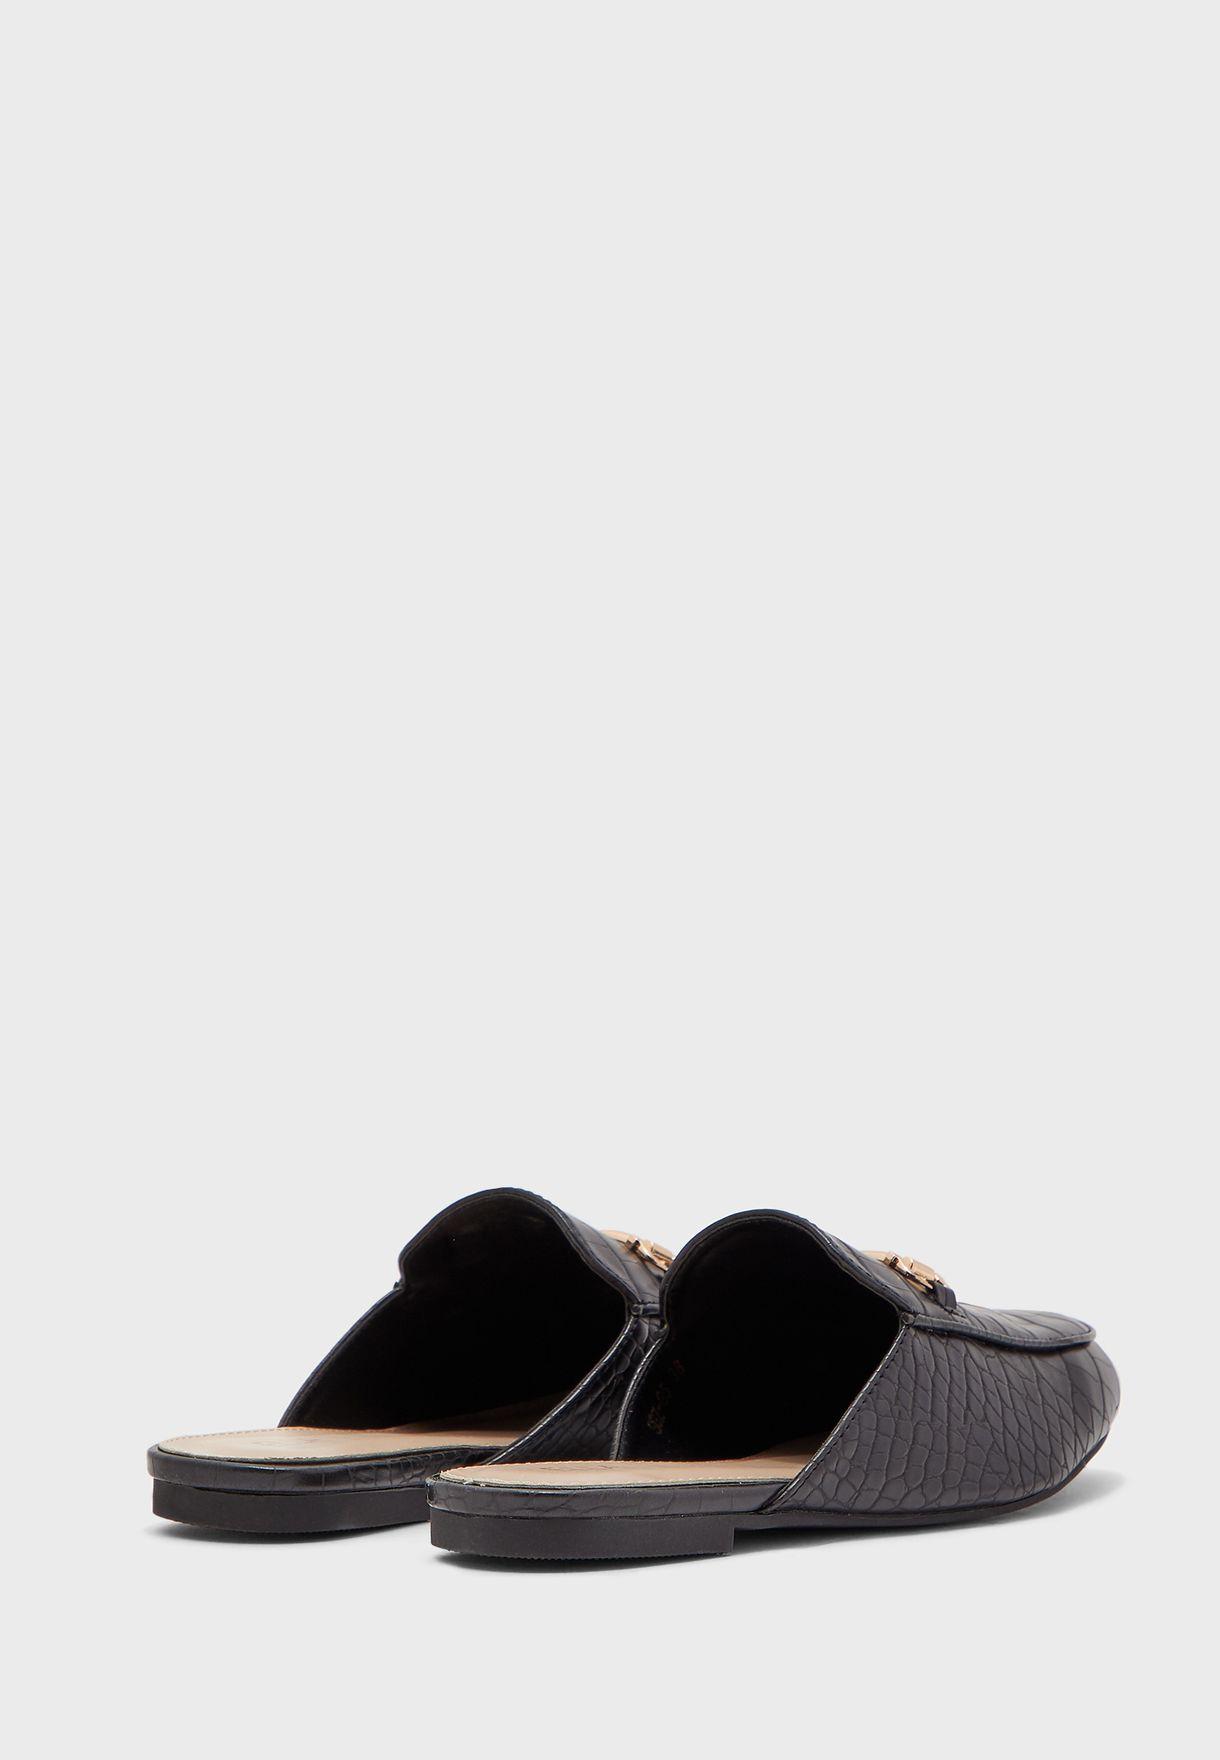 حذاء لوفر مبطن